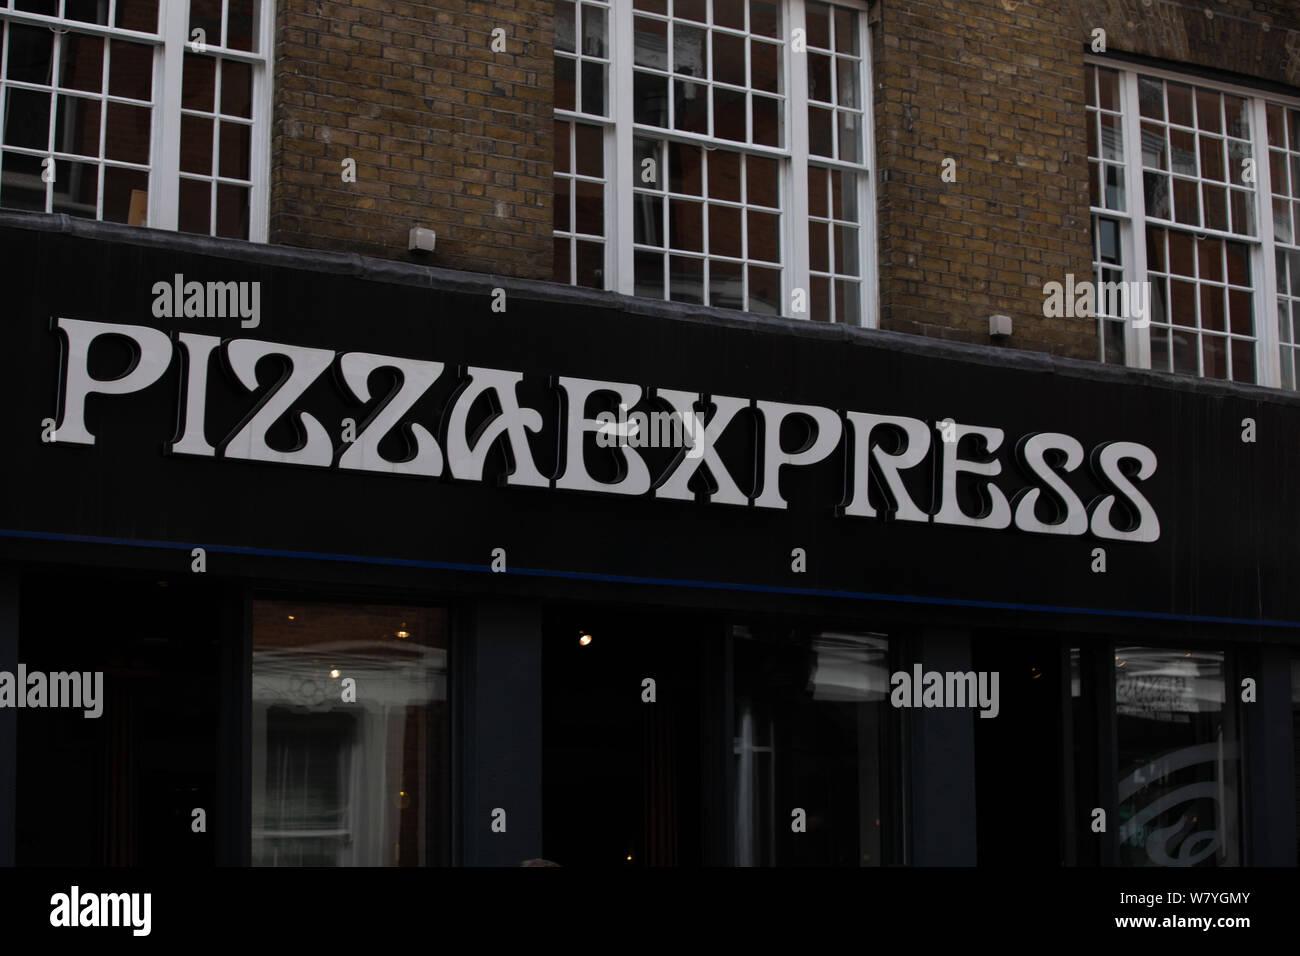 Pizza Express London Stock Photos Pizza Express London